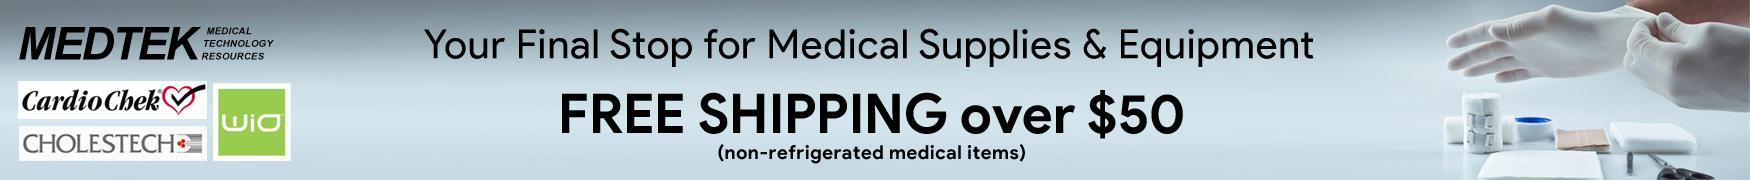 Medical Supplies & Equipment - MedTek